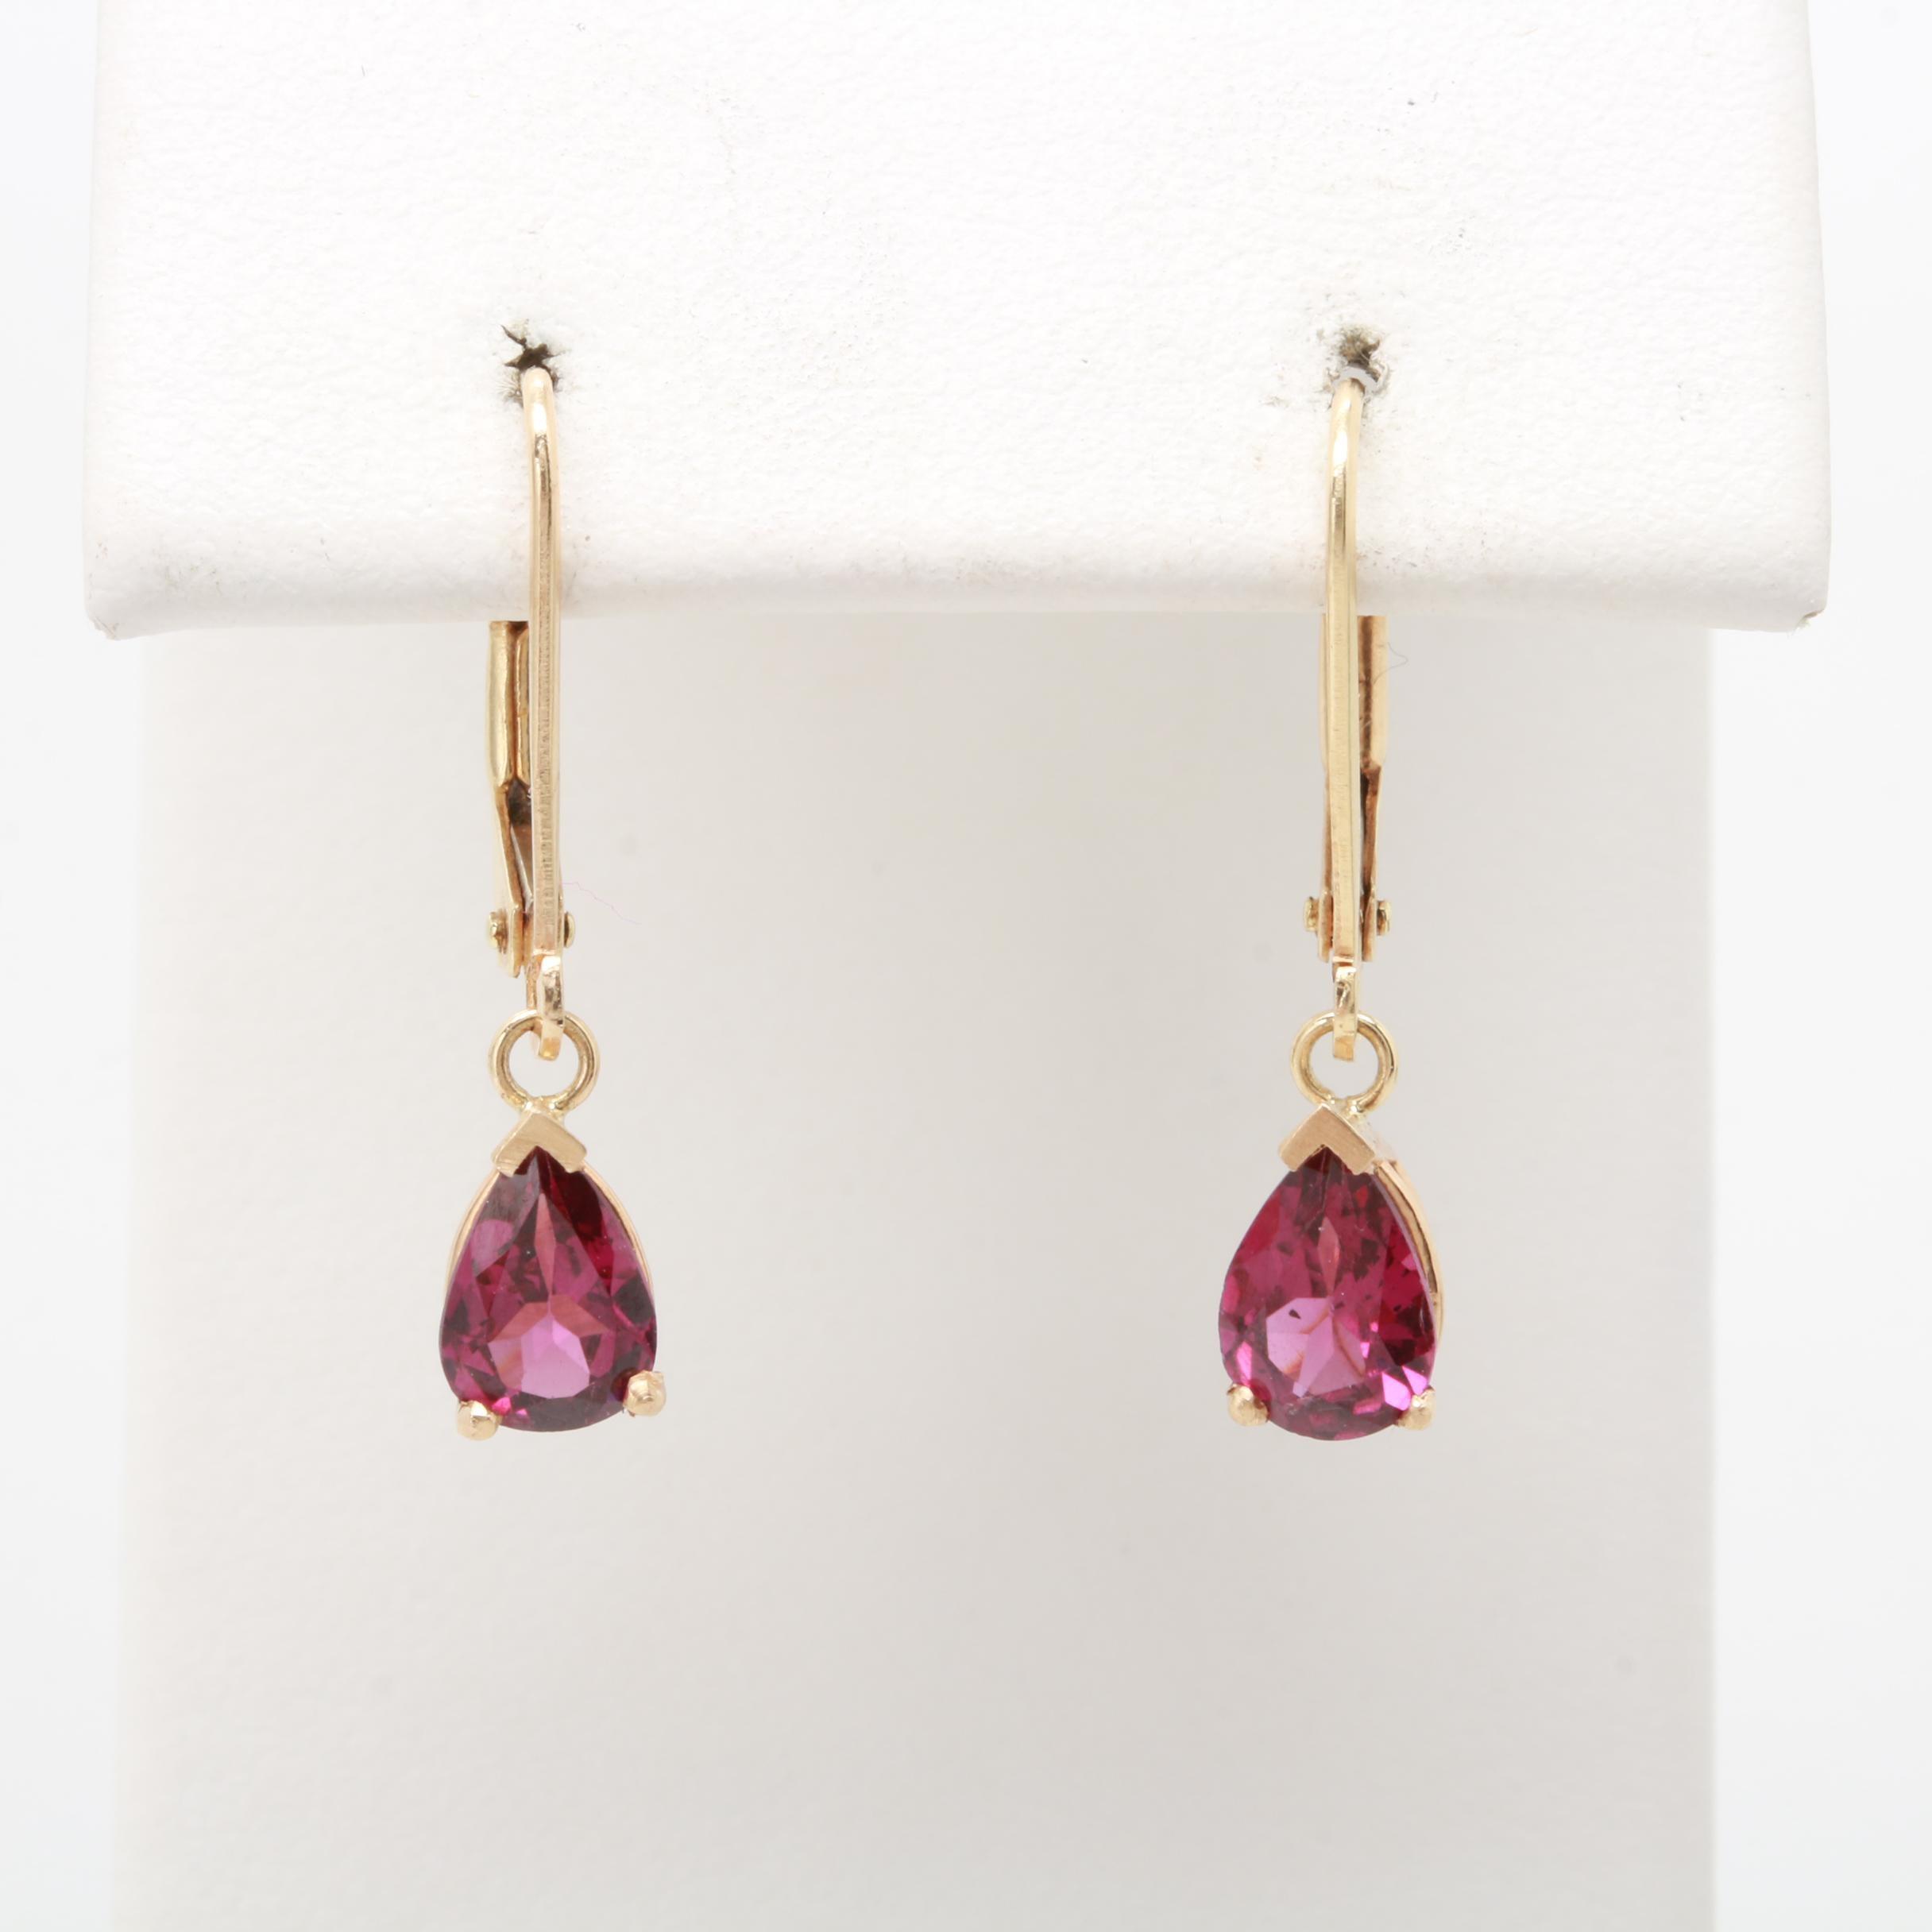 14K Yellow Gold Rhodolite Garnet Dangle Earrings